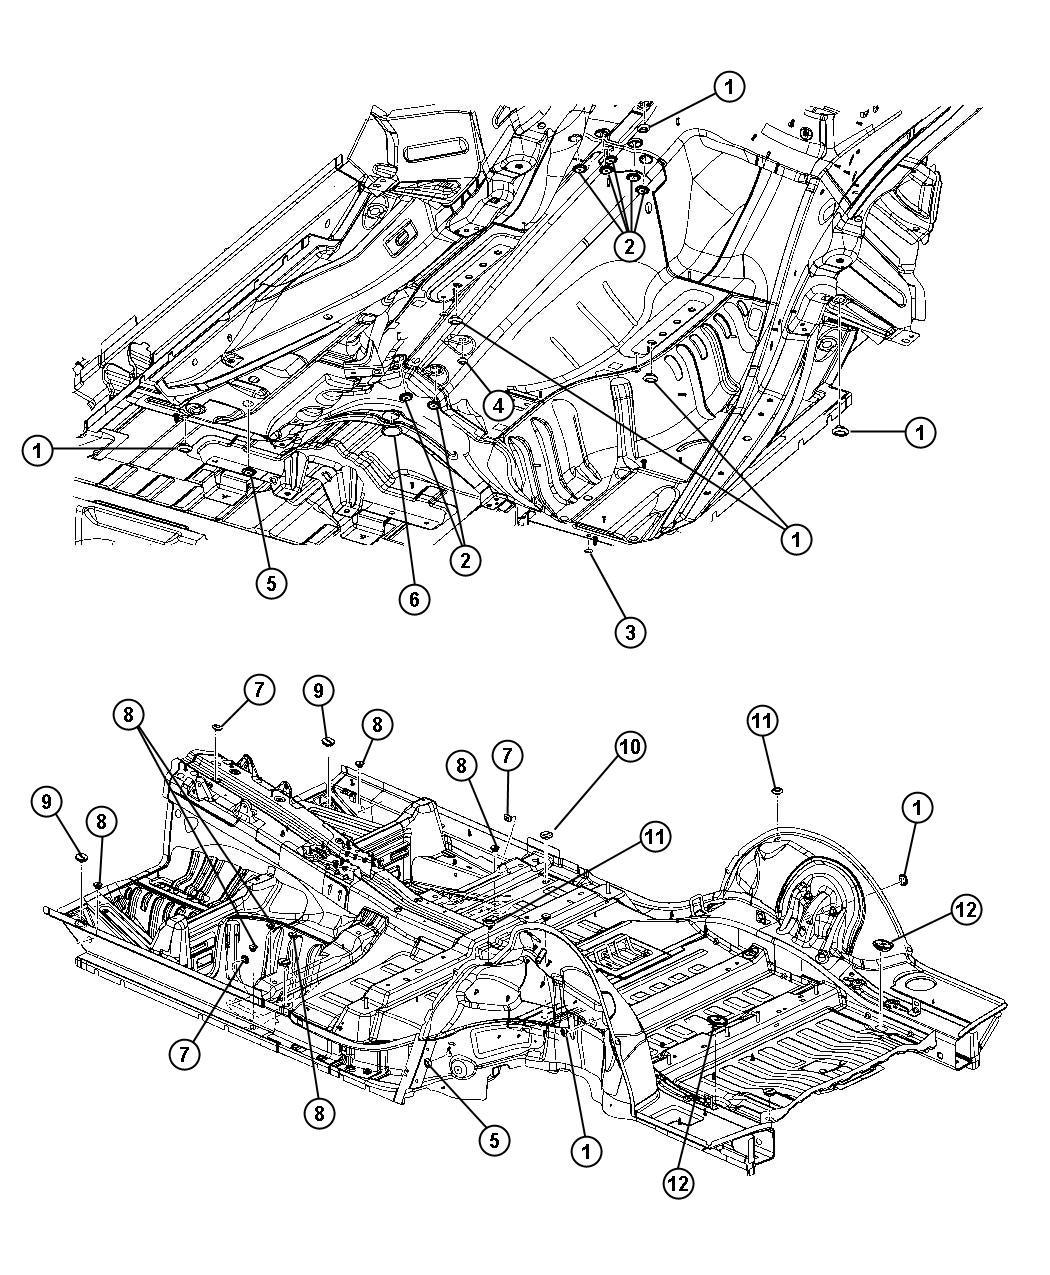 Dodge Durango Plug. Body. 1.655 diameter. Powerdefroster